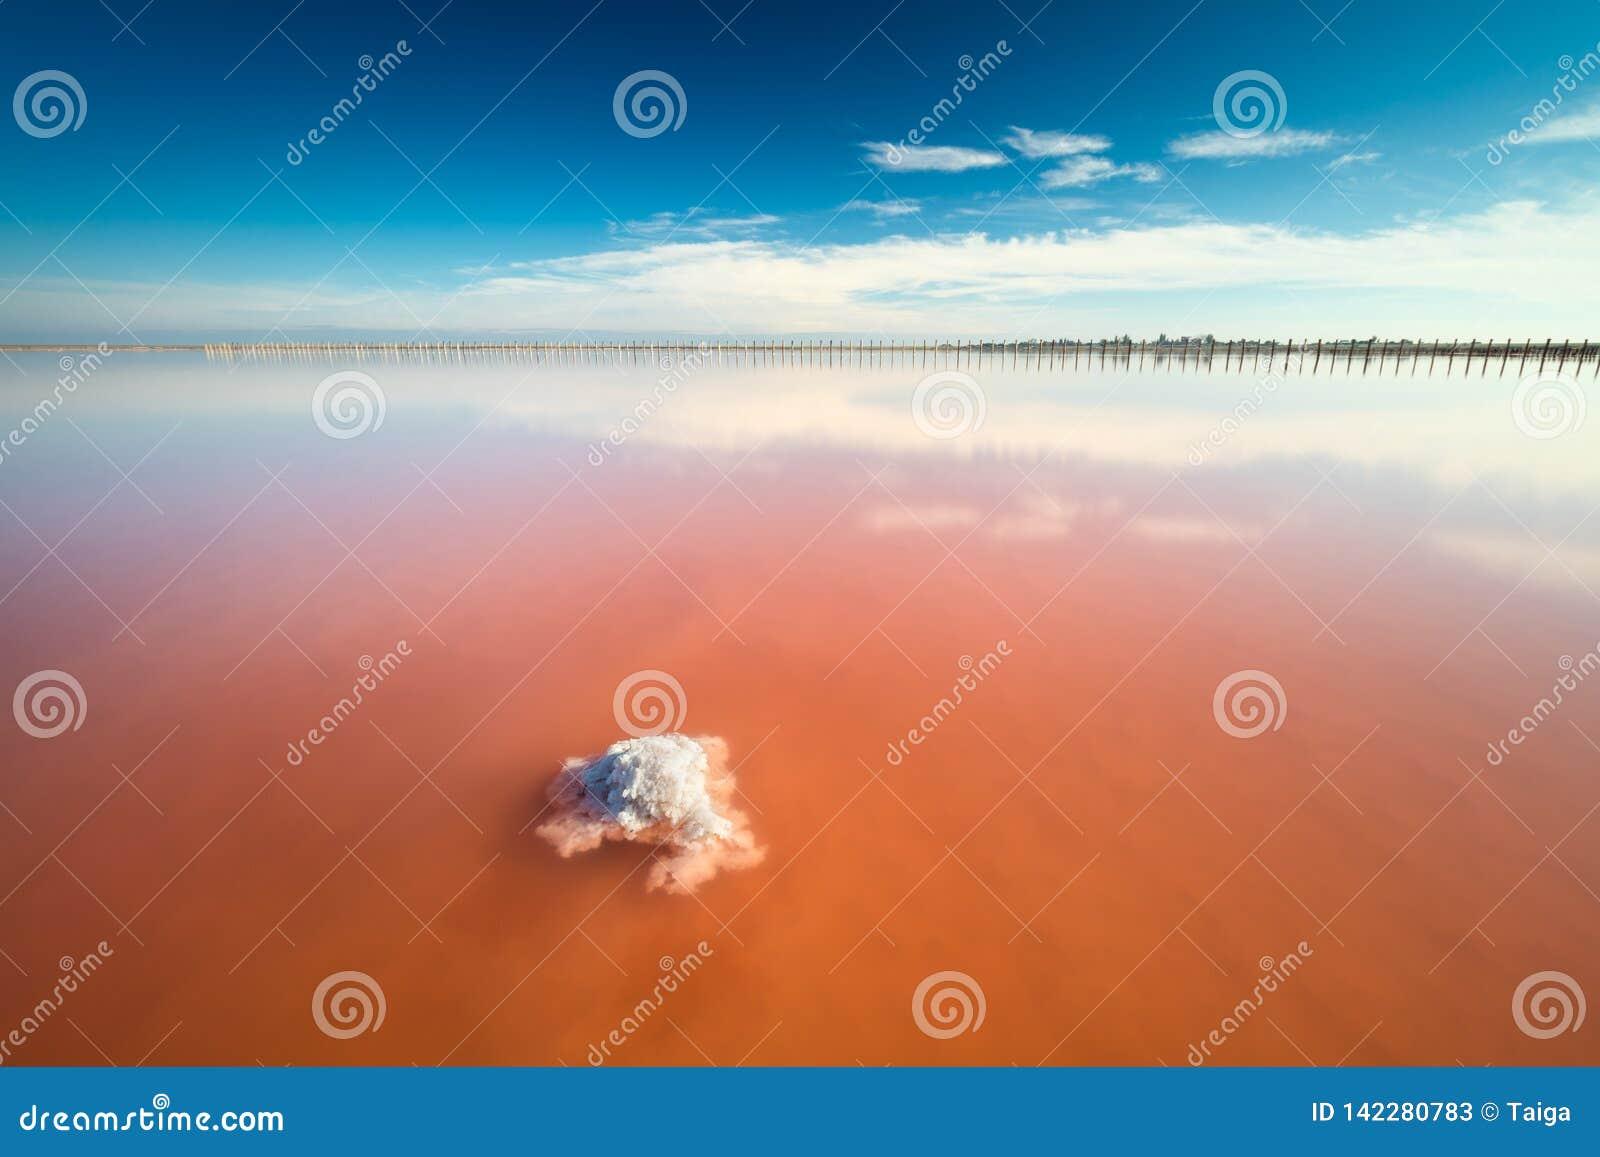 Lago de sal cor-de-rosa surpreendente real da cor e céu azul profundo, paisagem minimalistic